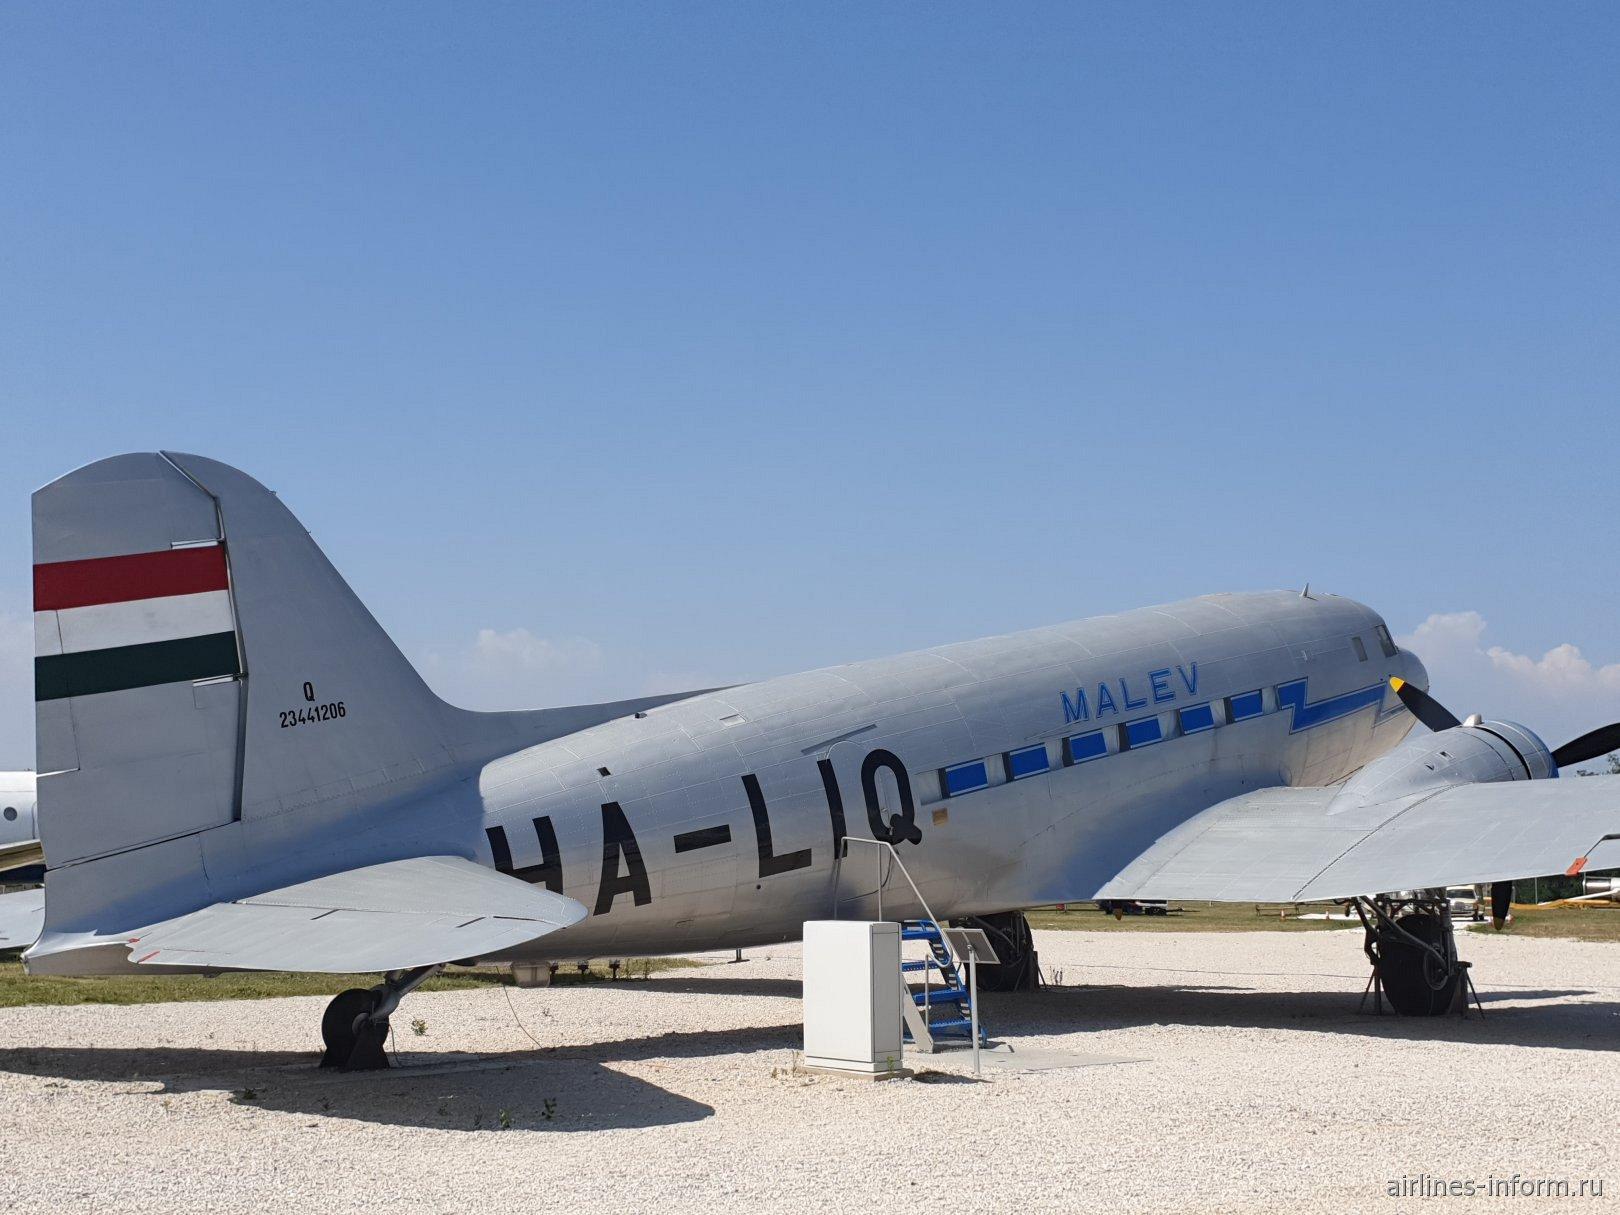 Самолет Ли-2 HA-LIQ авиакомпании Malev в авиационном музее в аэропорту Будапешта